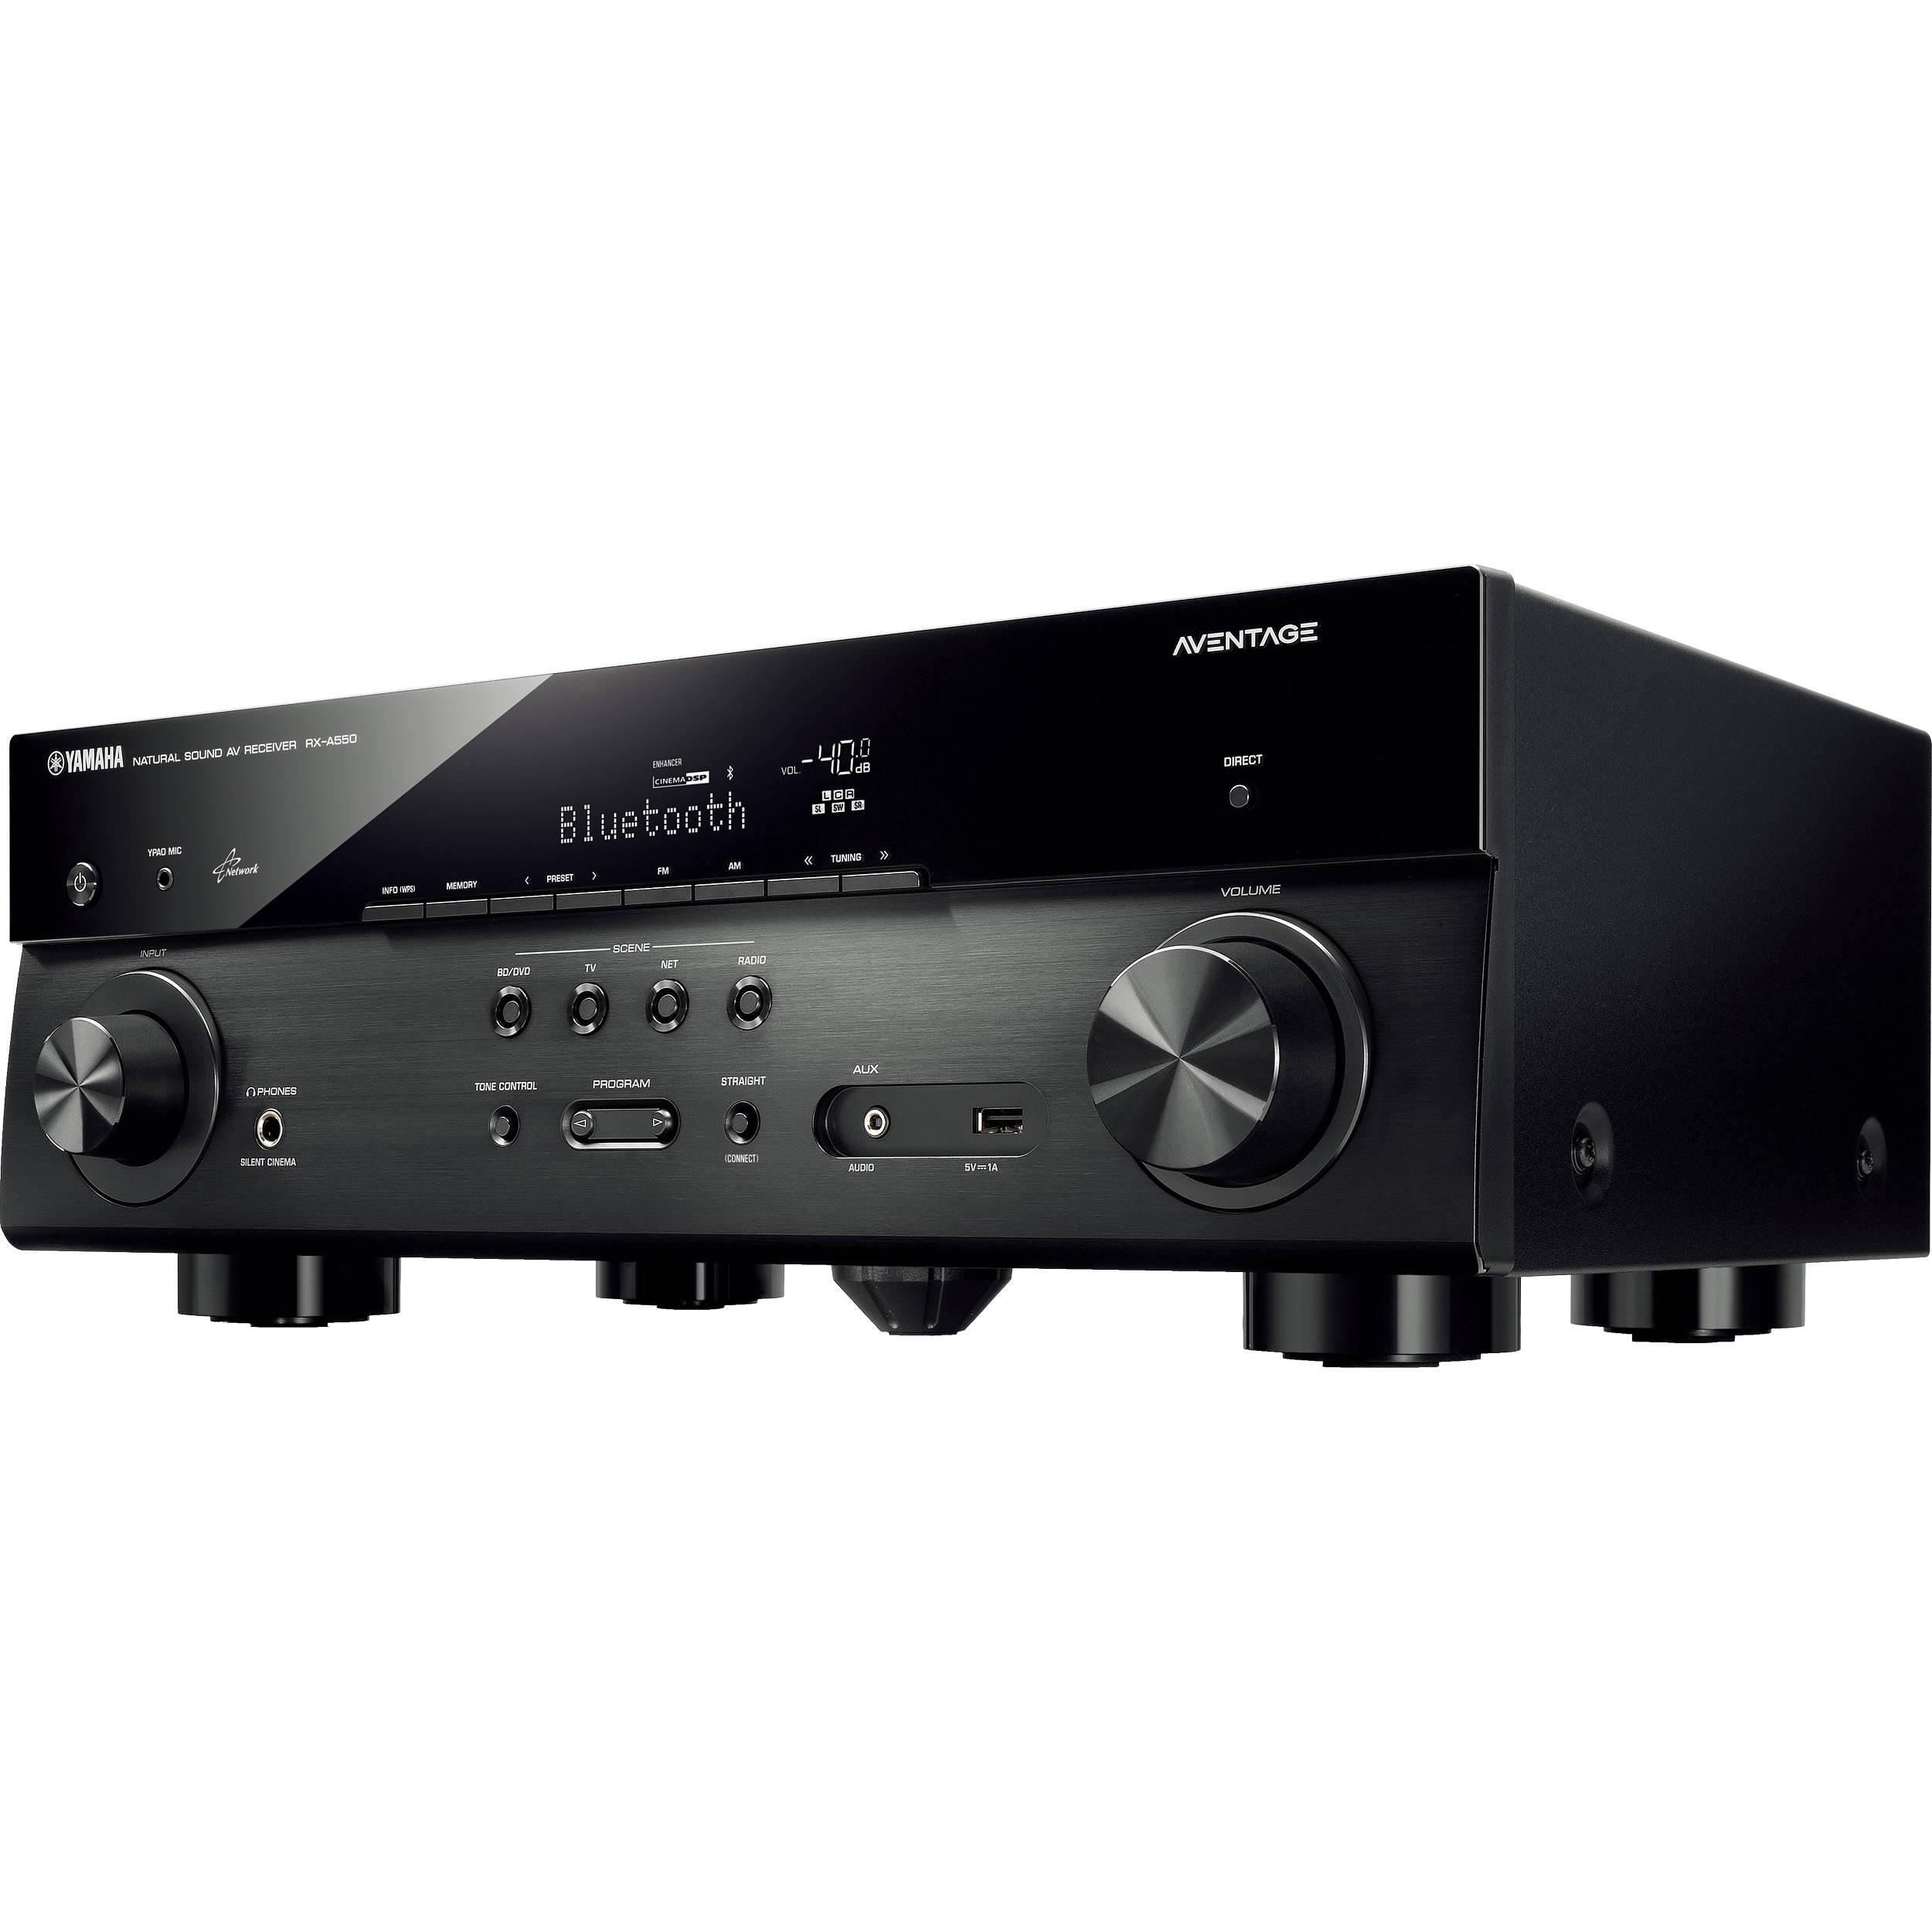 Yamaha AVENTAGE RX-A550BL 5 1-Channel Network AV Receiver (Black)